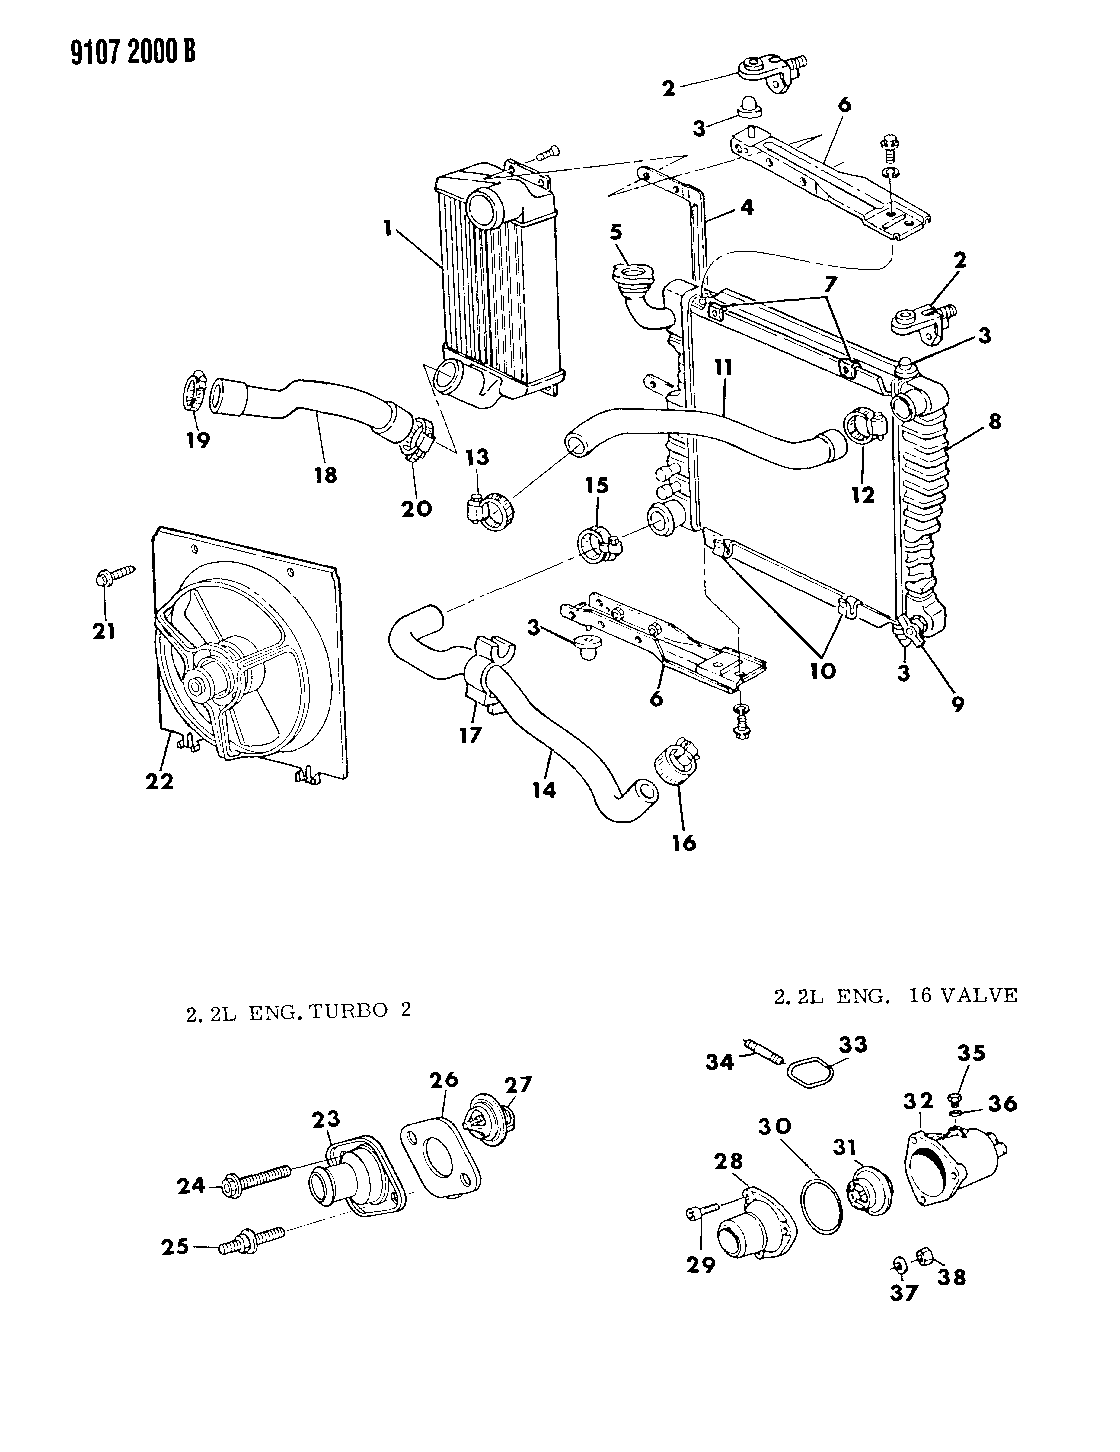 1989 chrysler lebaron gtc radiator intercooler related parts rh moparpartsgiant com 1989 Chrysler LeBaron Dashboard Dodge Wiring Schematics Diagrams